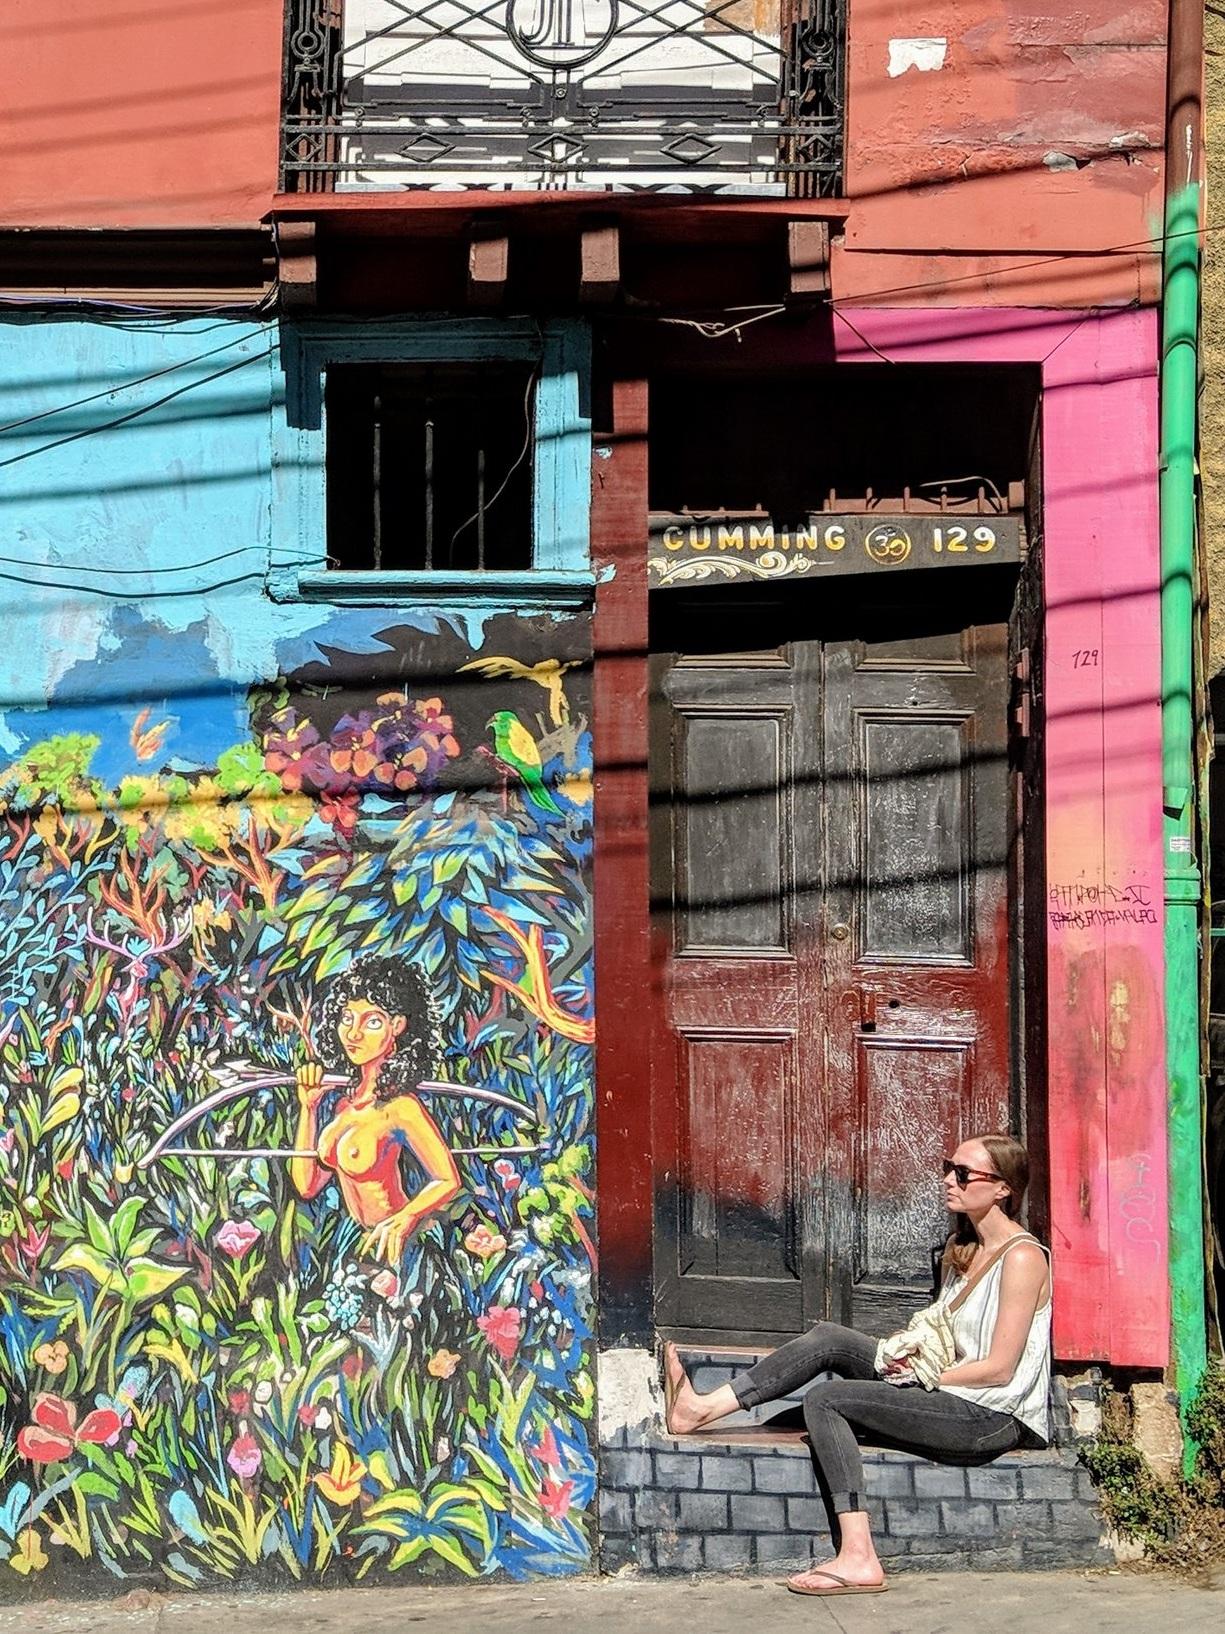 Street Art in Valpariso, Chile